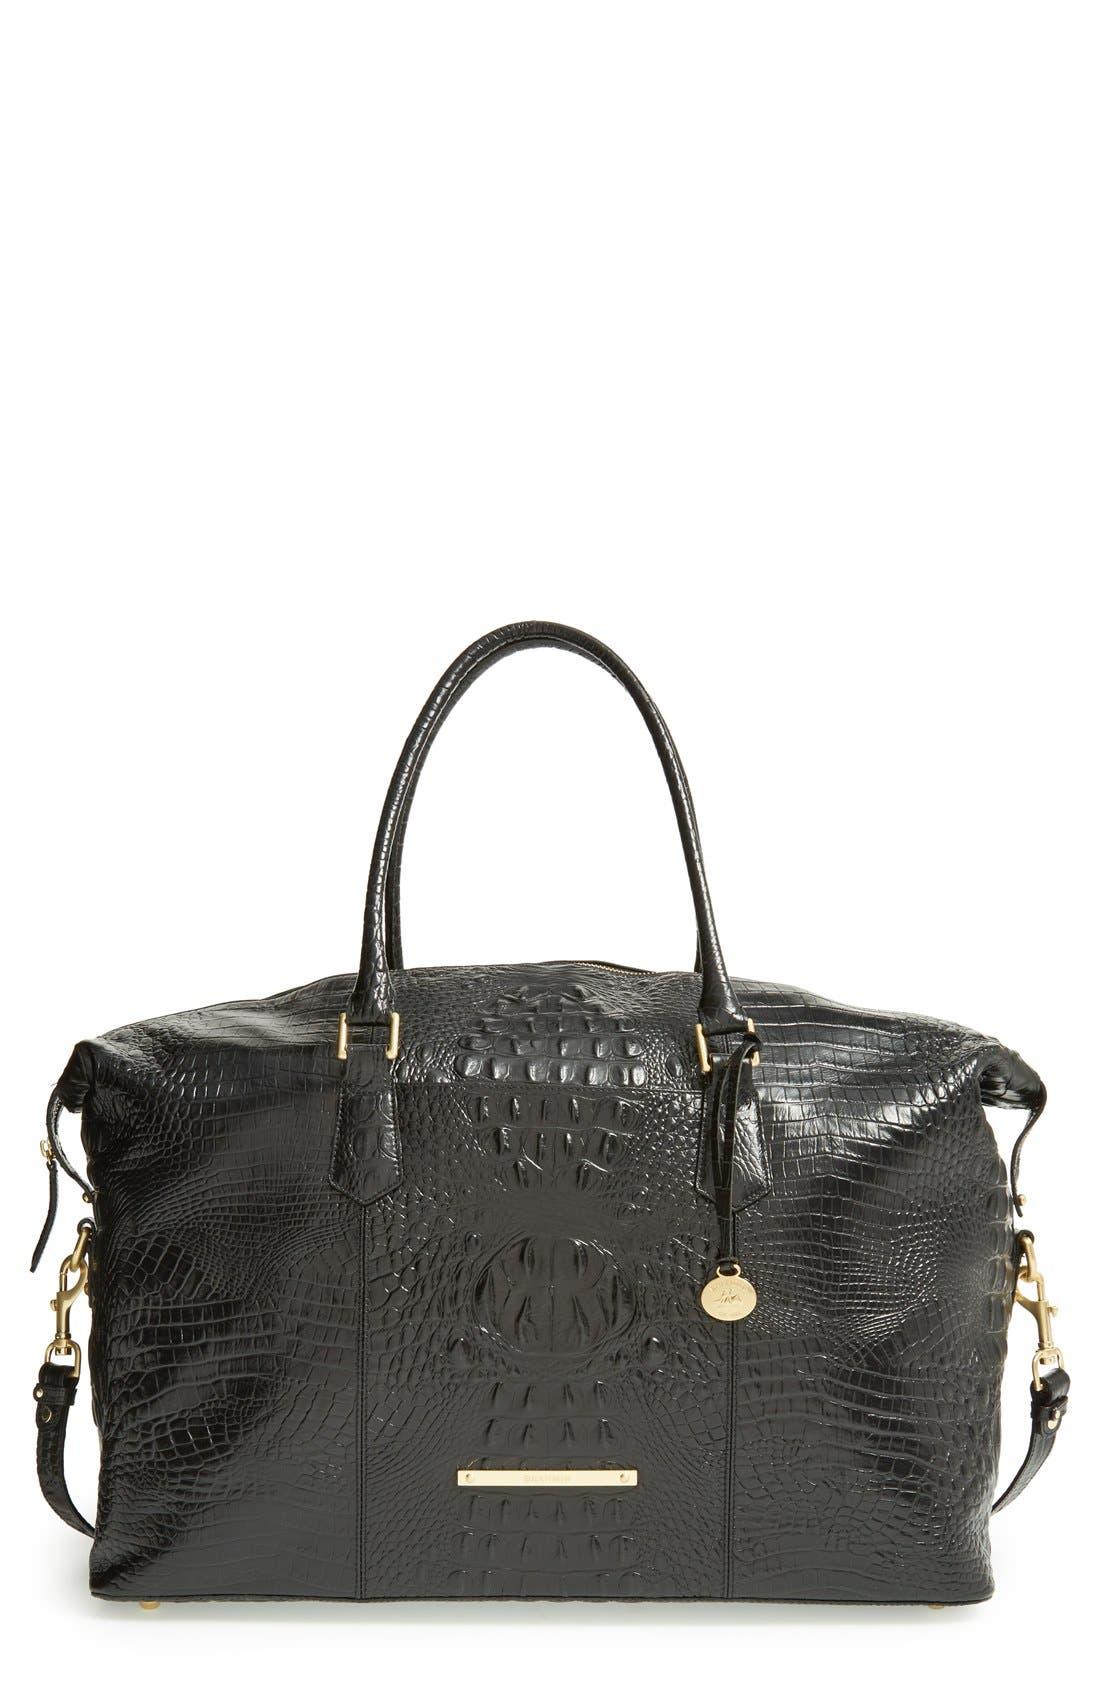 Main Image - Brahmin 'Duxbury' Leather Travel Bag